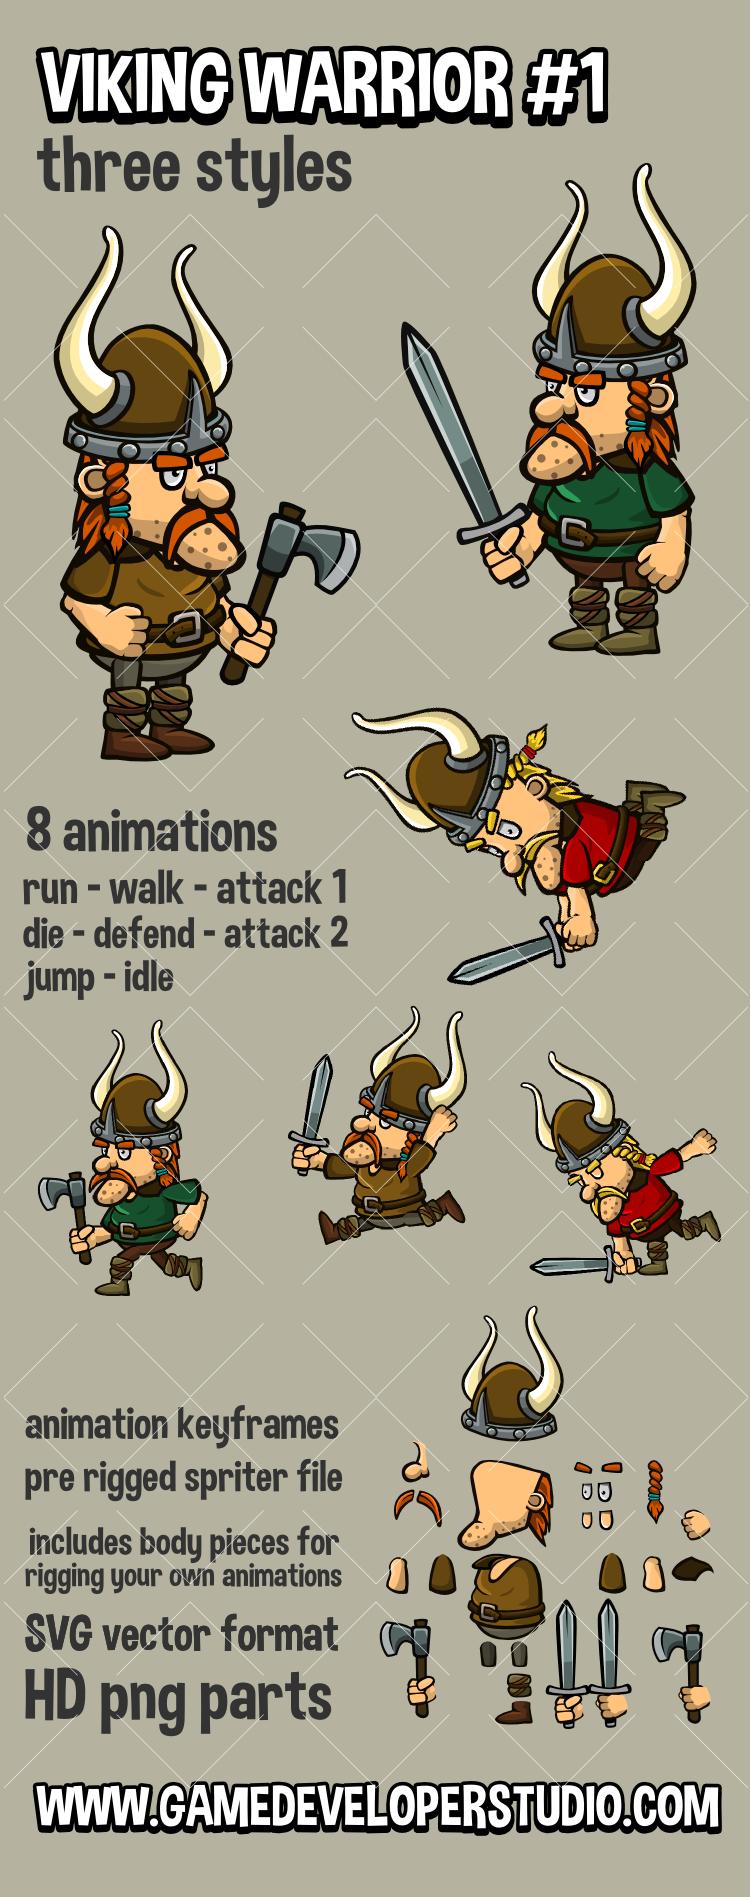 Animated viking game sprite one